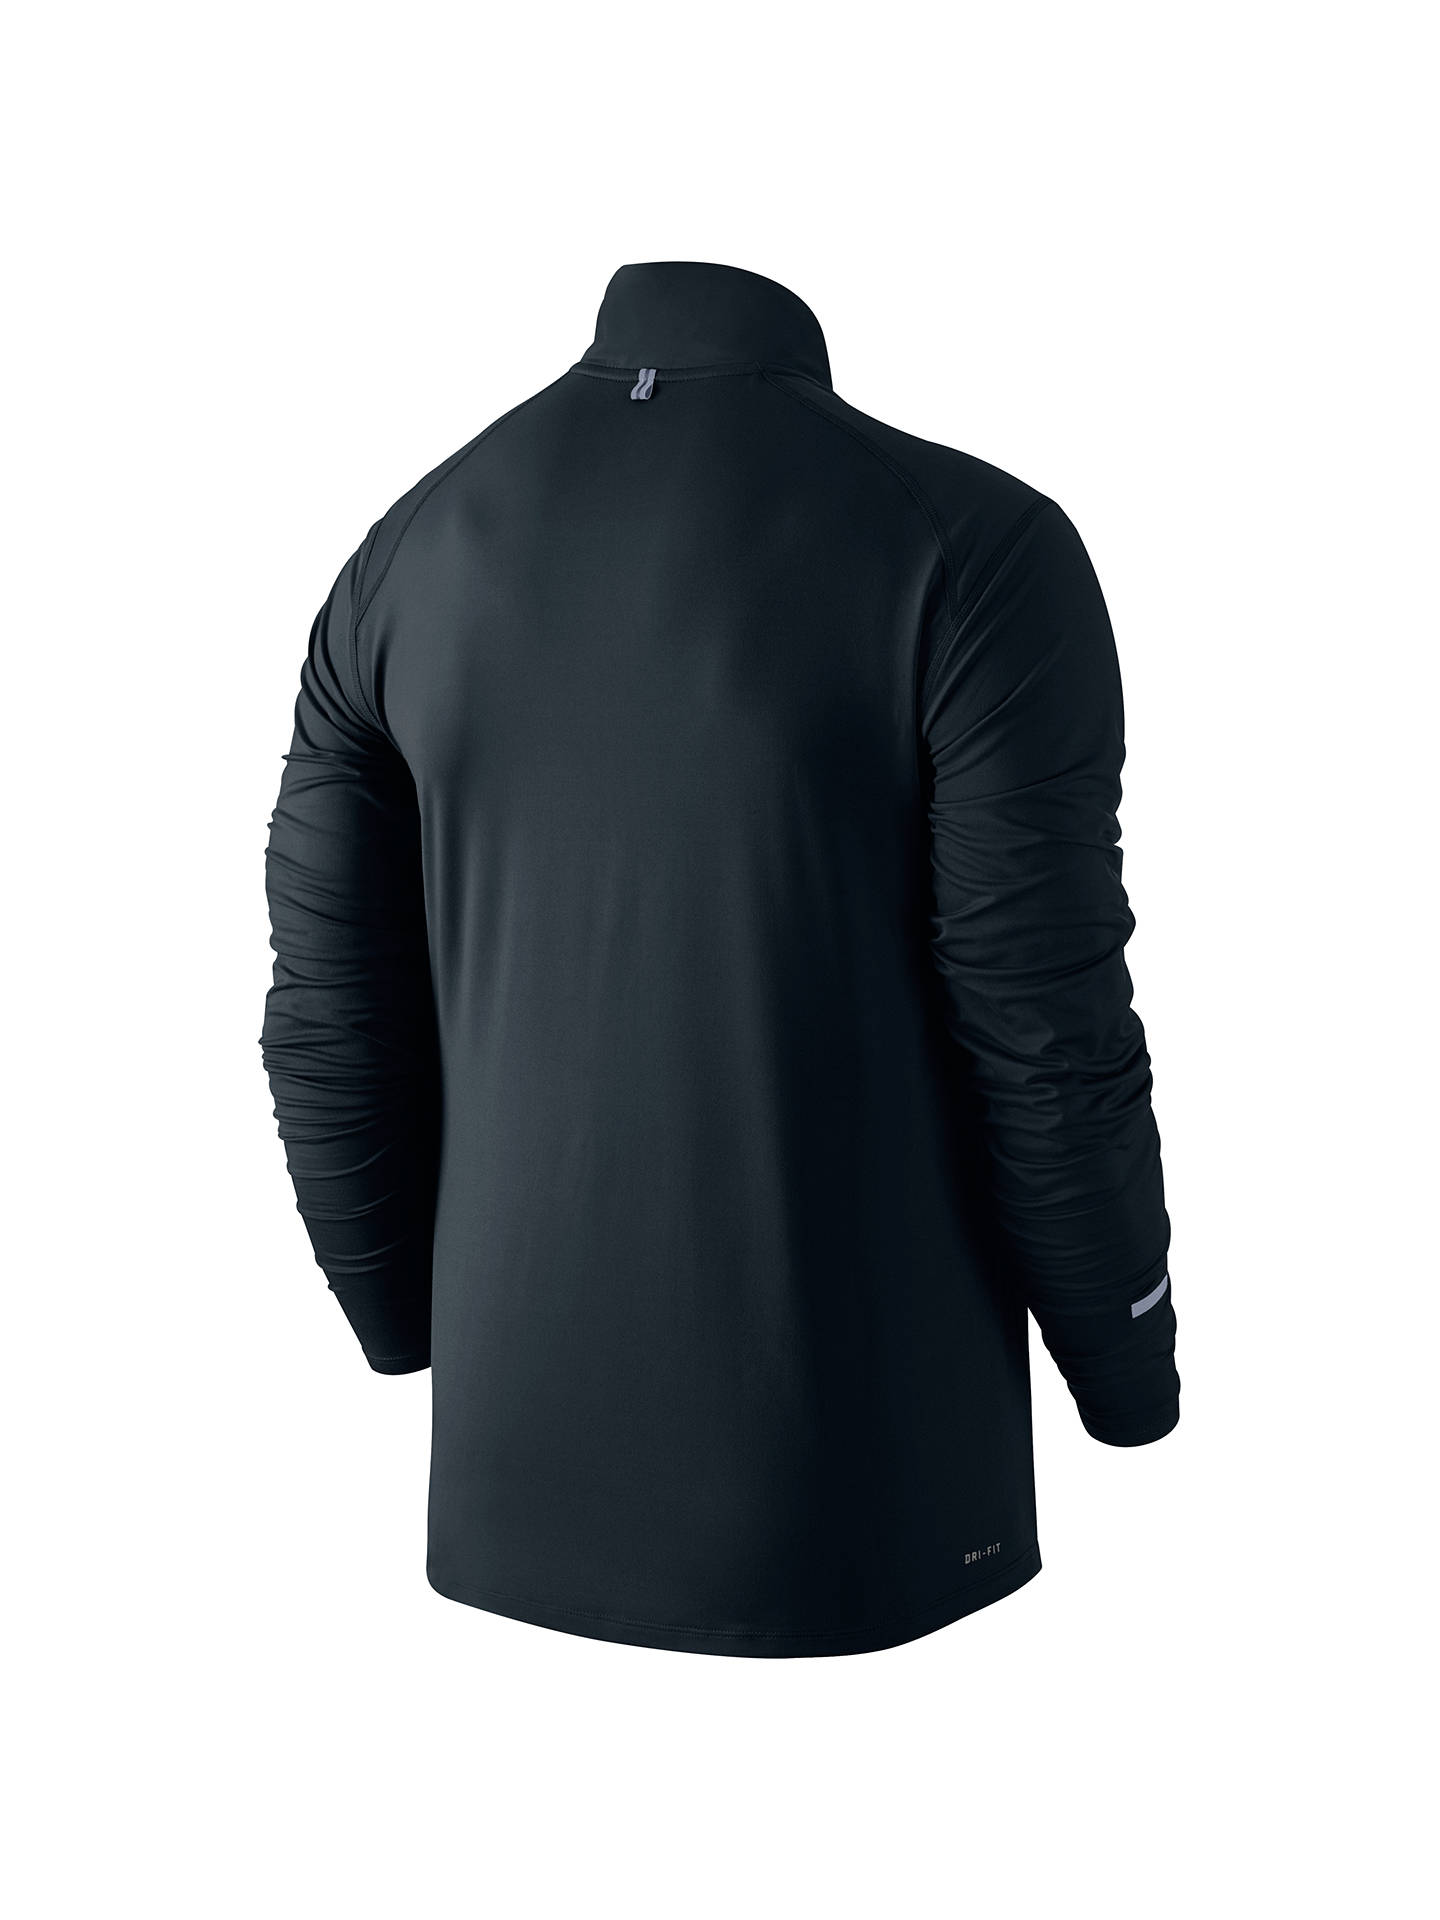 99d56350d ... Buy Nike Dri-FIT Element Half-Zip Long Sleeve Running Top, Black, ...